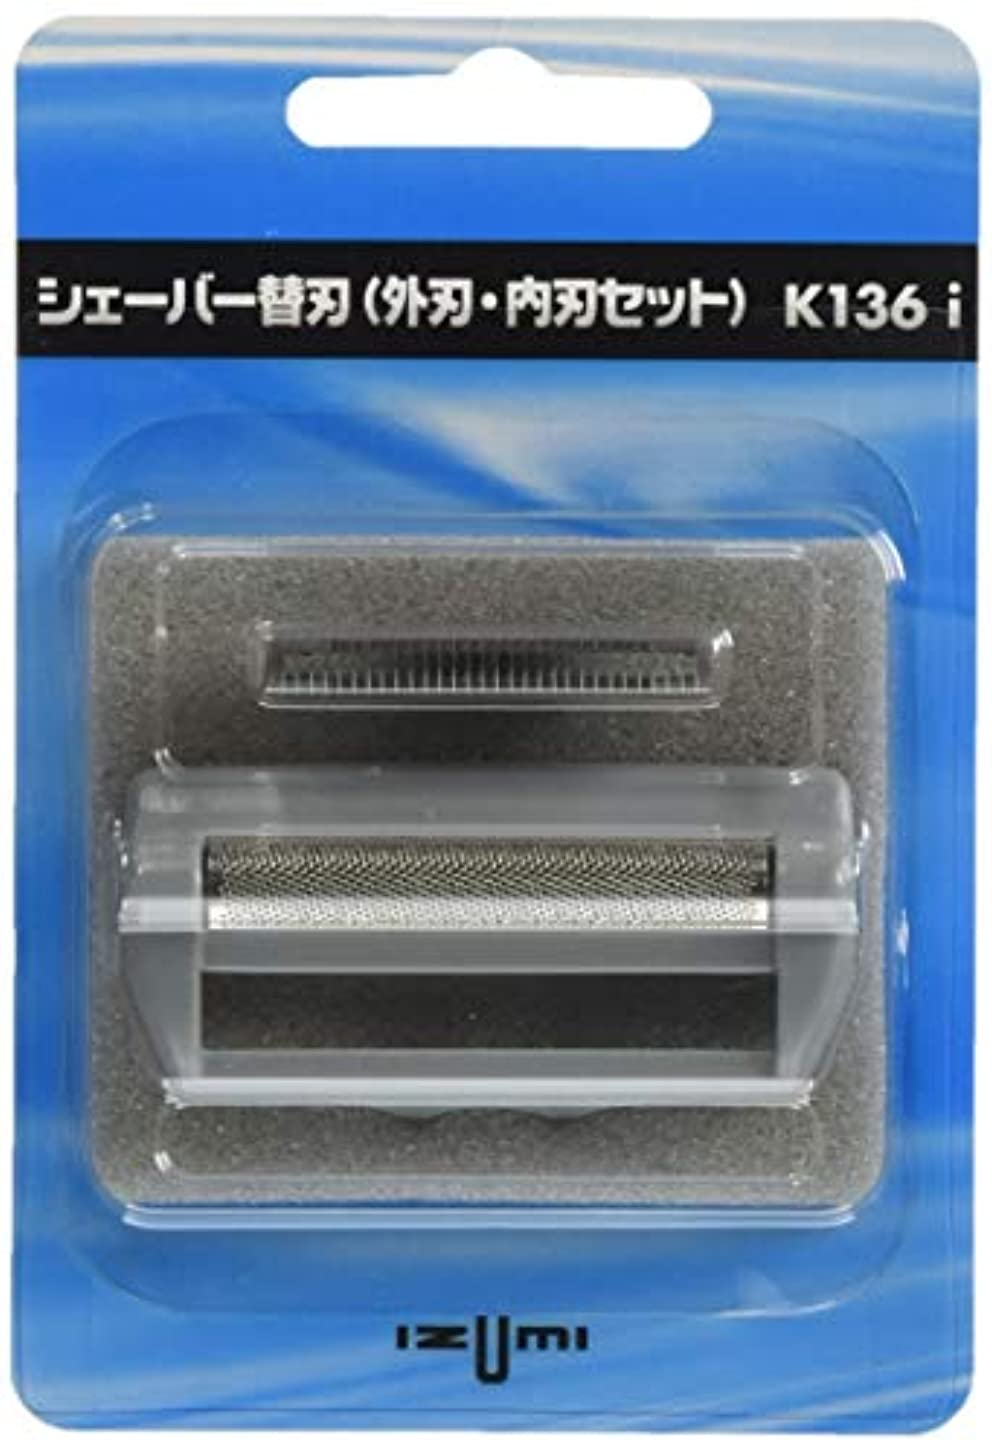 IZUMI(泉精器製作所) 往復式シェーバー用内刃?外刃セット 替刃 K136i